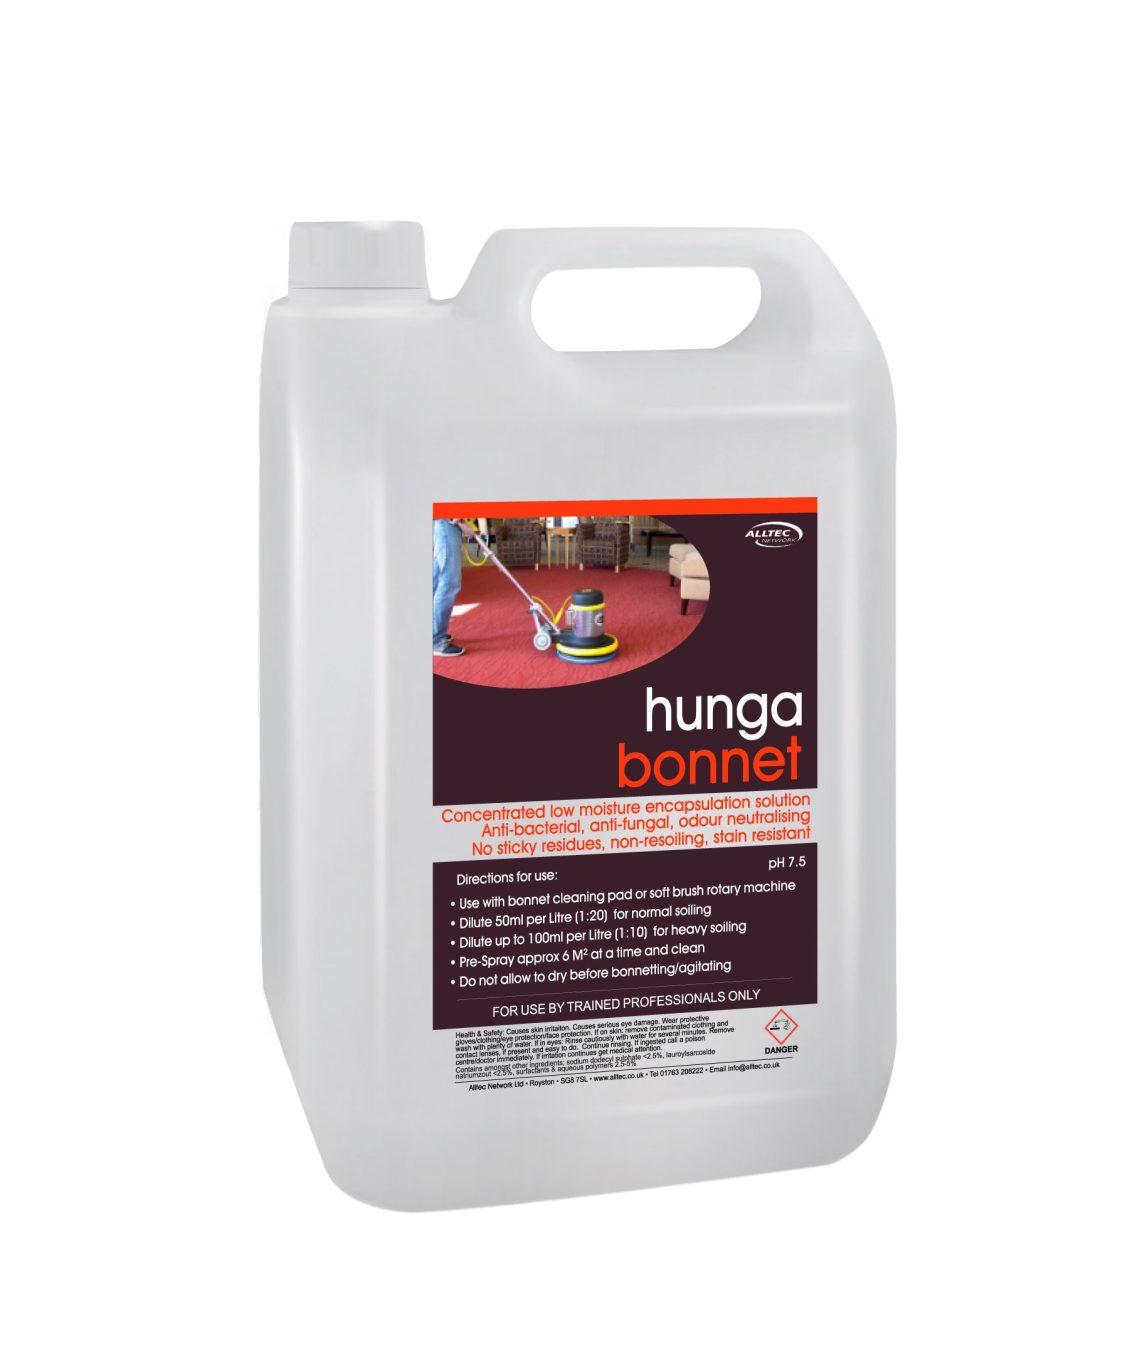 Hunga Bonnet Encapsulation Solution Professional Carpet Cleaning Solutions Professional Carpet Cleaning Machines Alltec Network